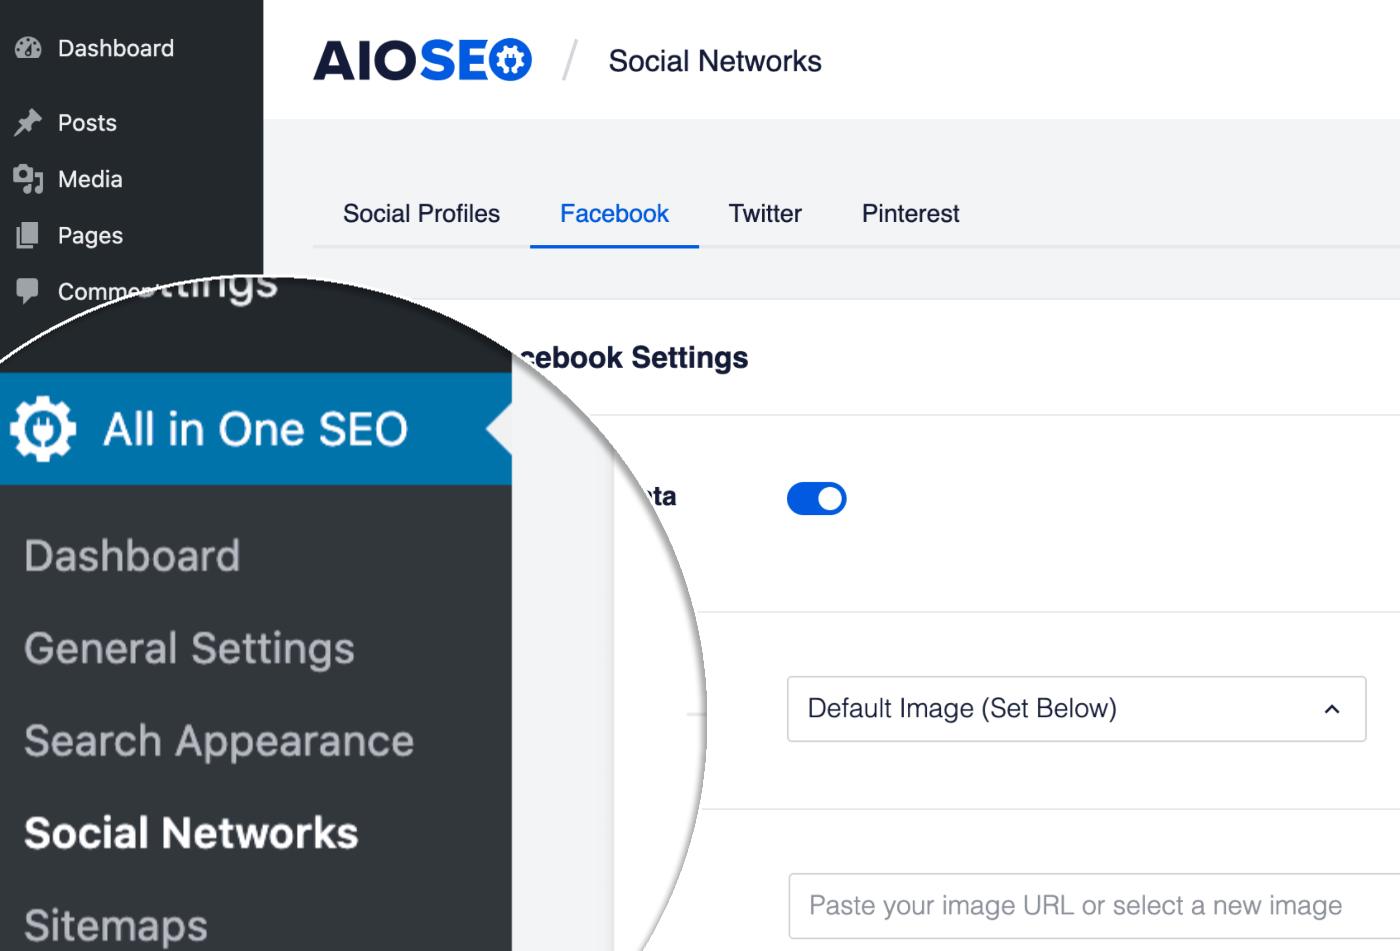 Social Networks menu item in All in One SEO